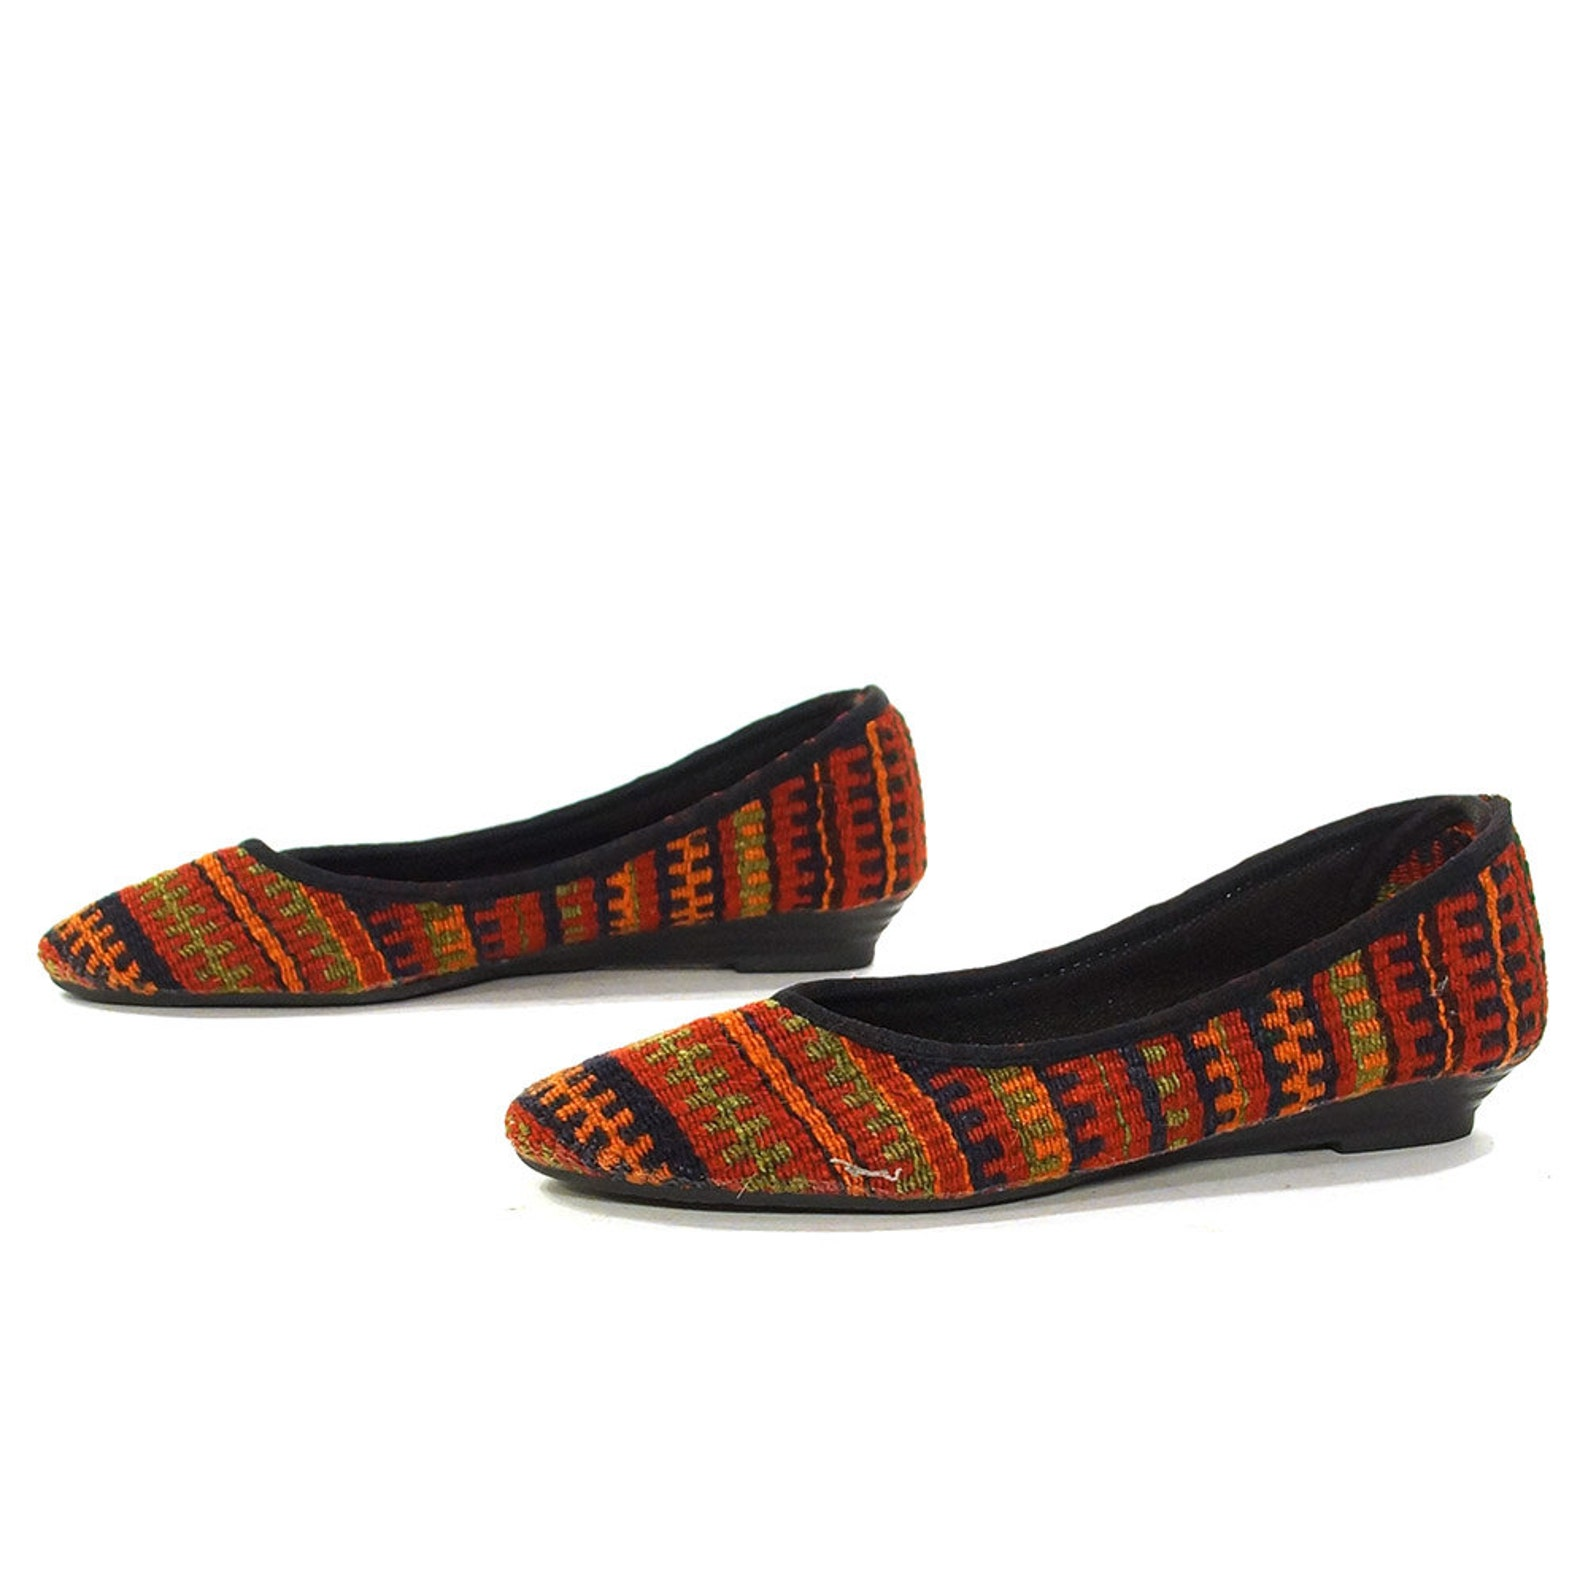 kilim ballet flats vintage 90s slip on carpet loafers woven ethnic boho hippie southwestern tapestry shoes round toe stripe patt